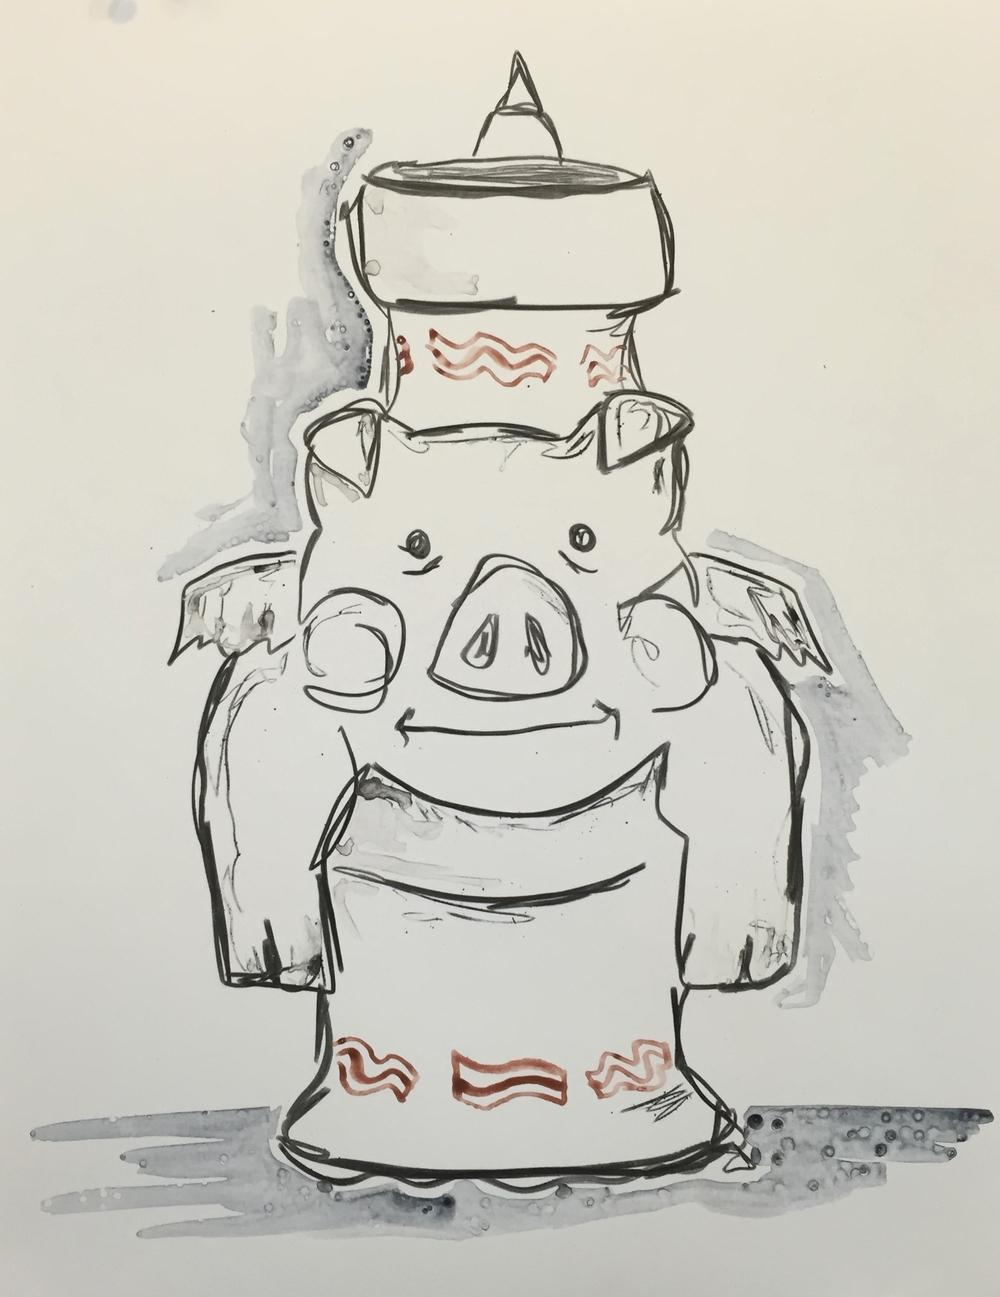 General Pig